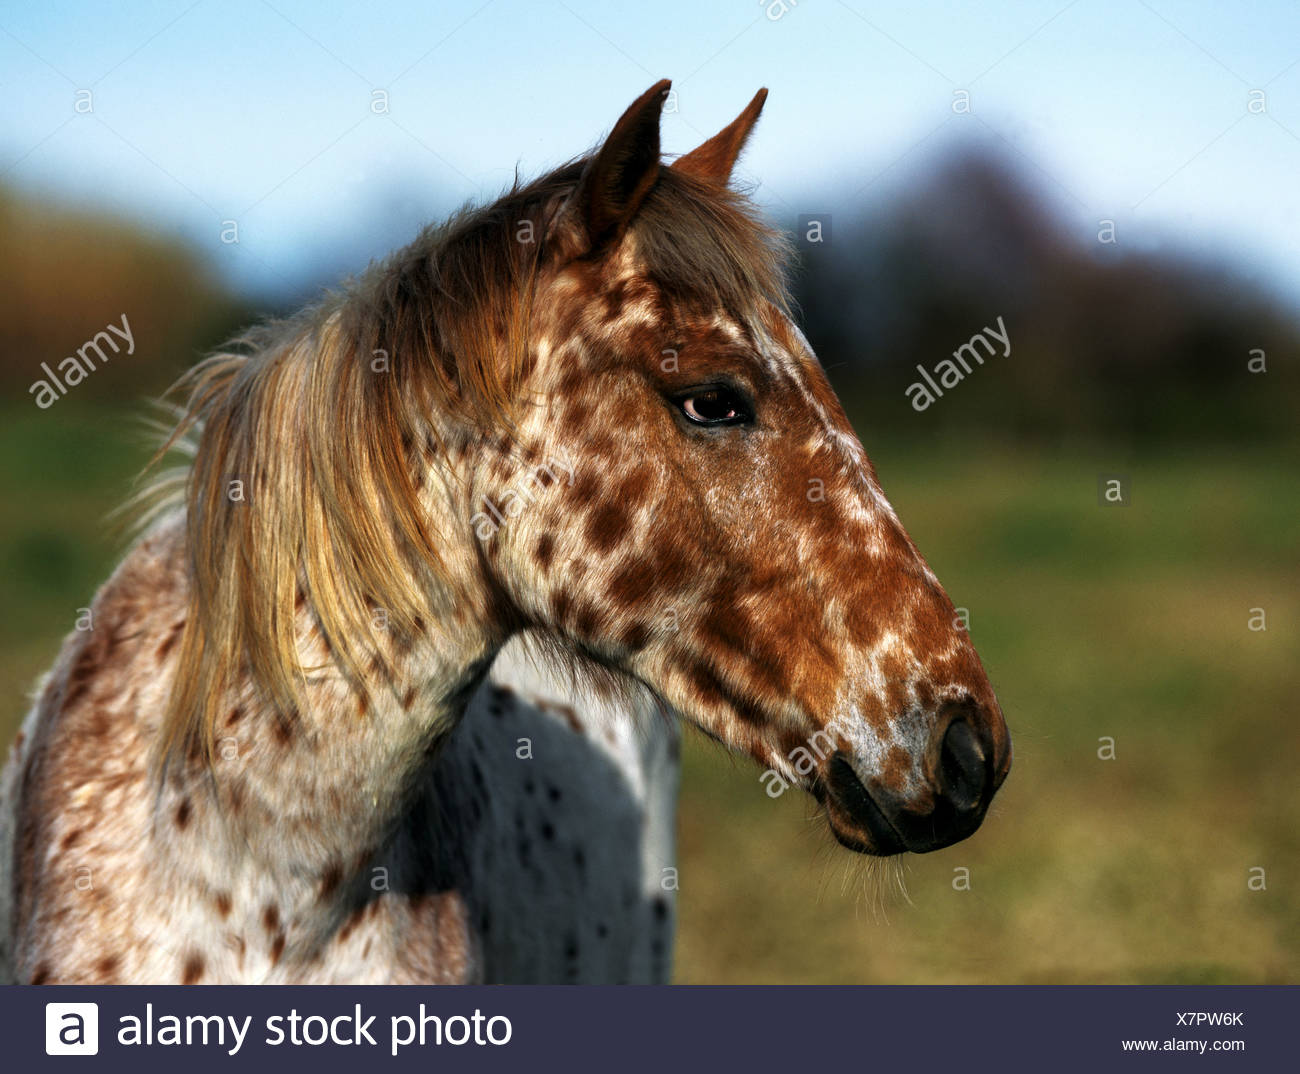 Appaloosa Horse Stock Photos & Appaloosa Horse Stock Images